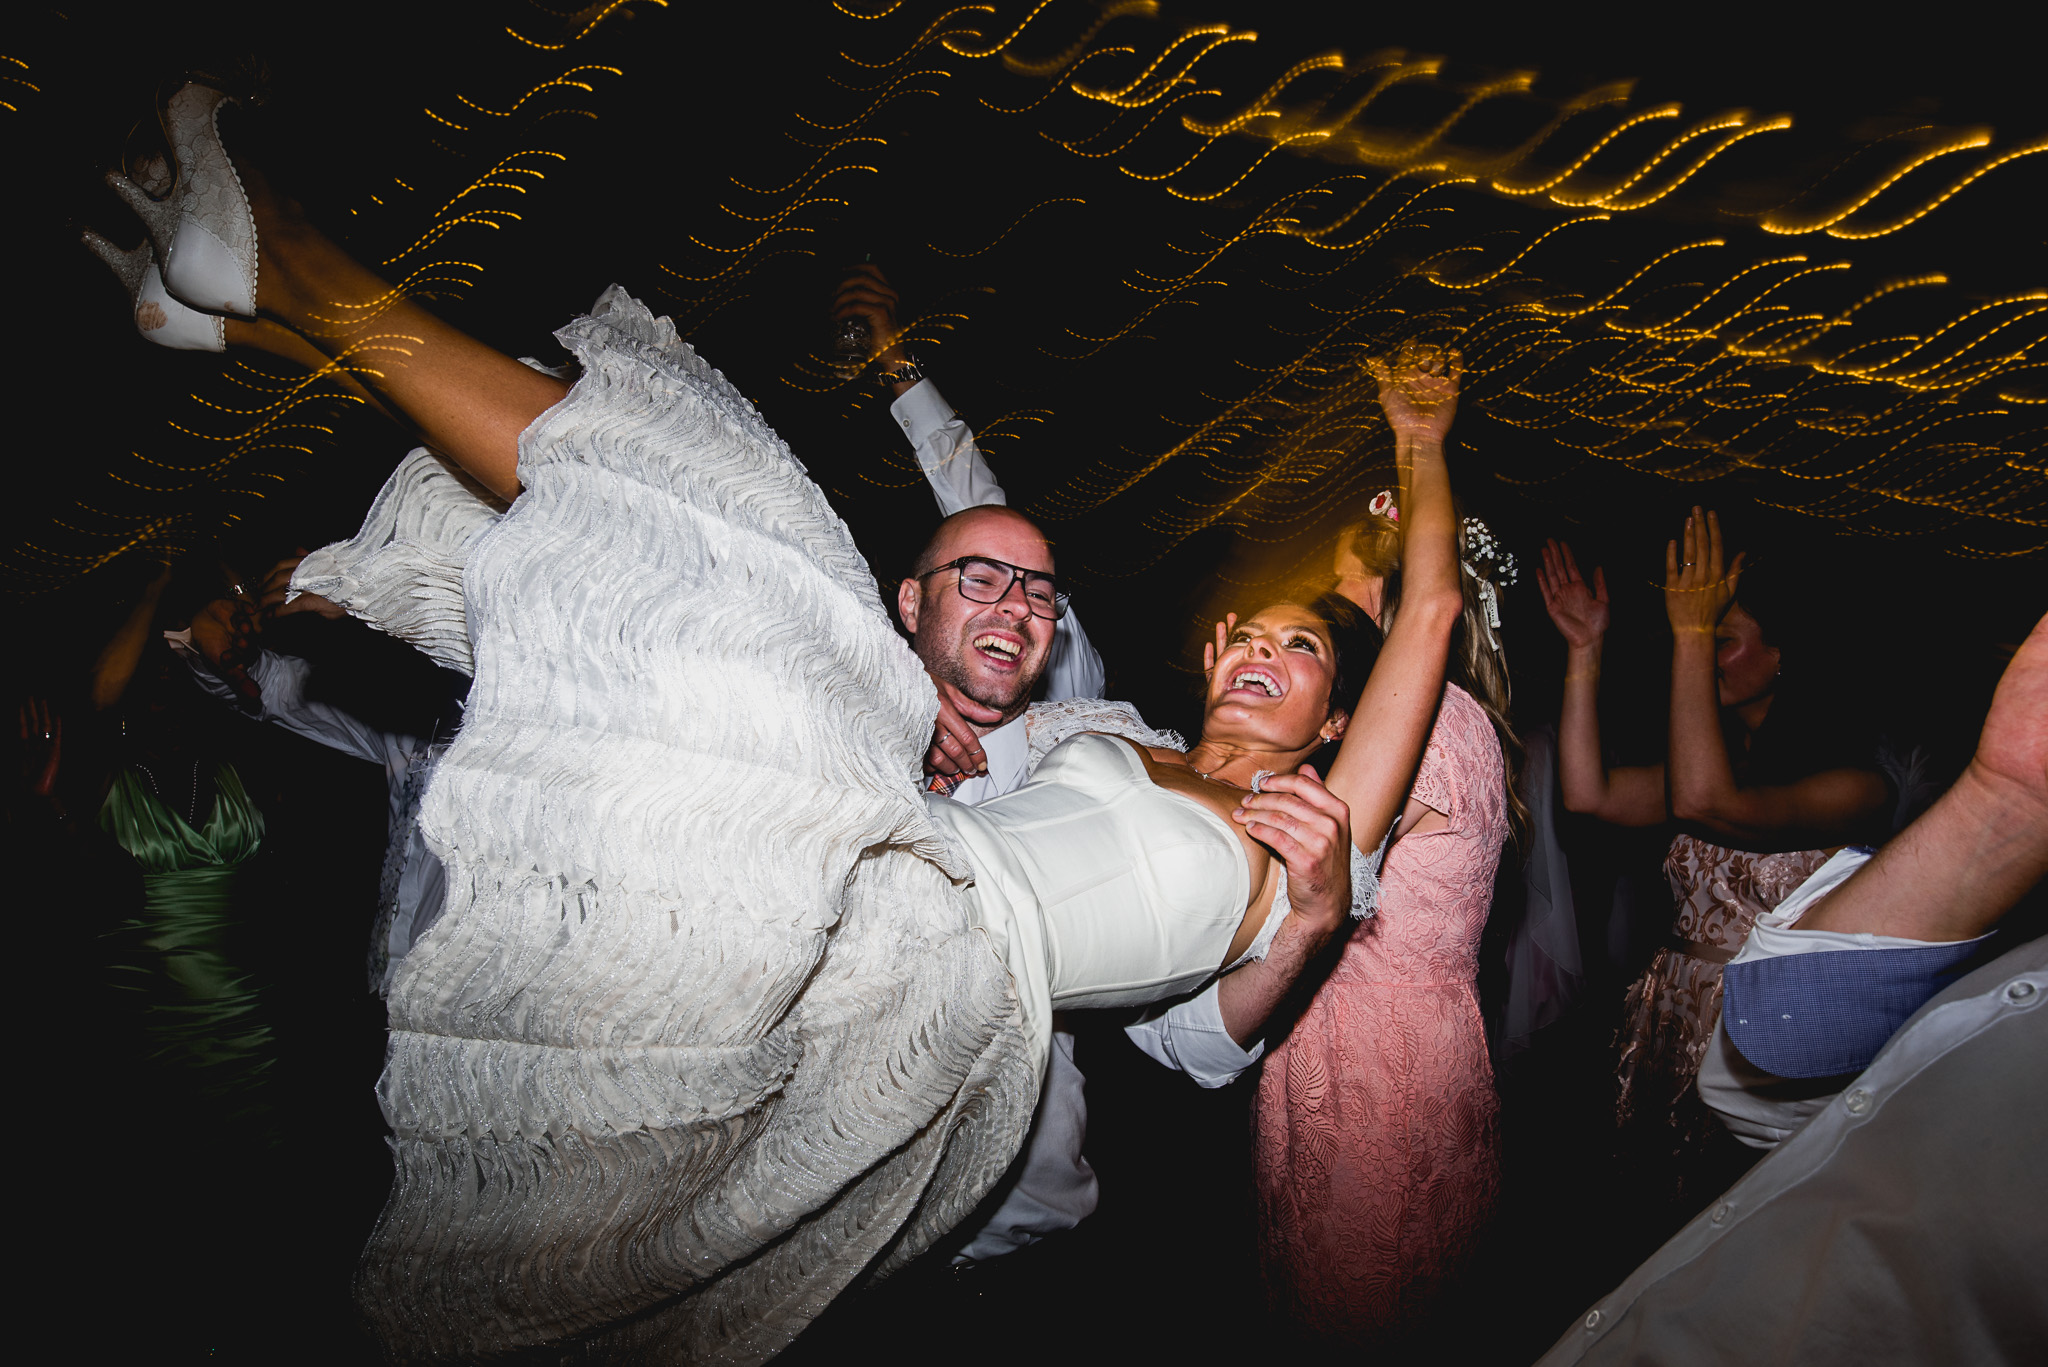 Lara & Jack Wedding 220815 by Barney Walters_1074_BW2_1182